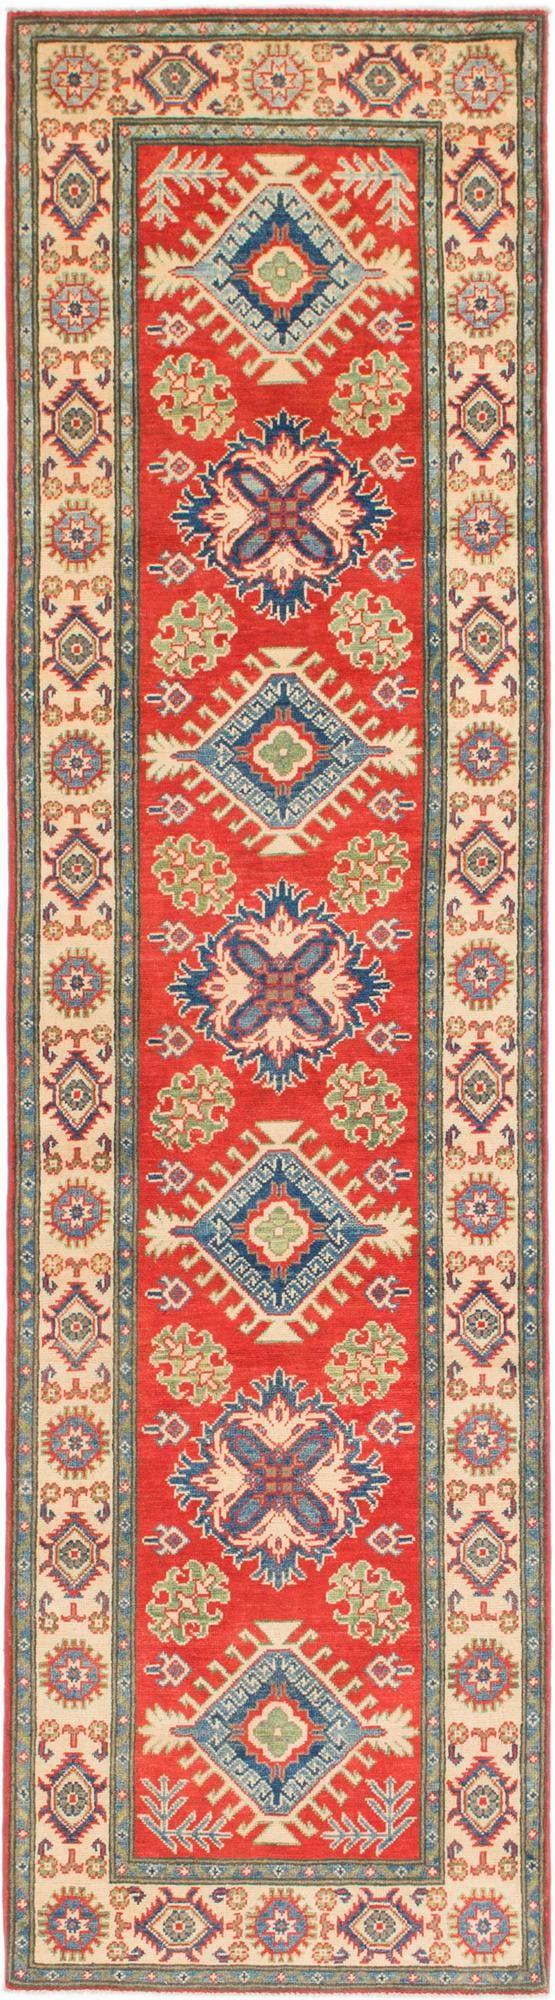 2' 8 x 10' Kazak Runner Rug main image